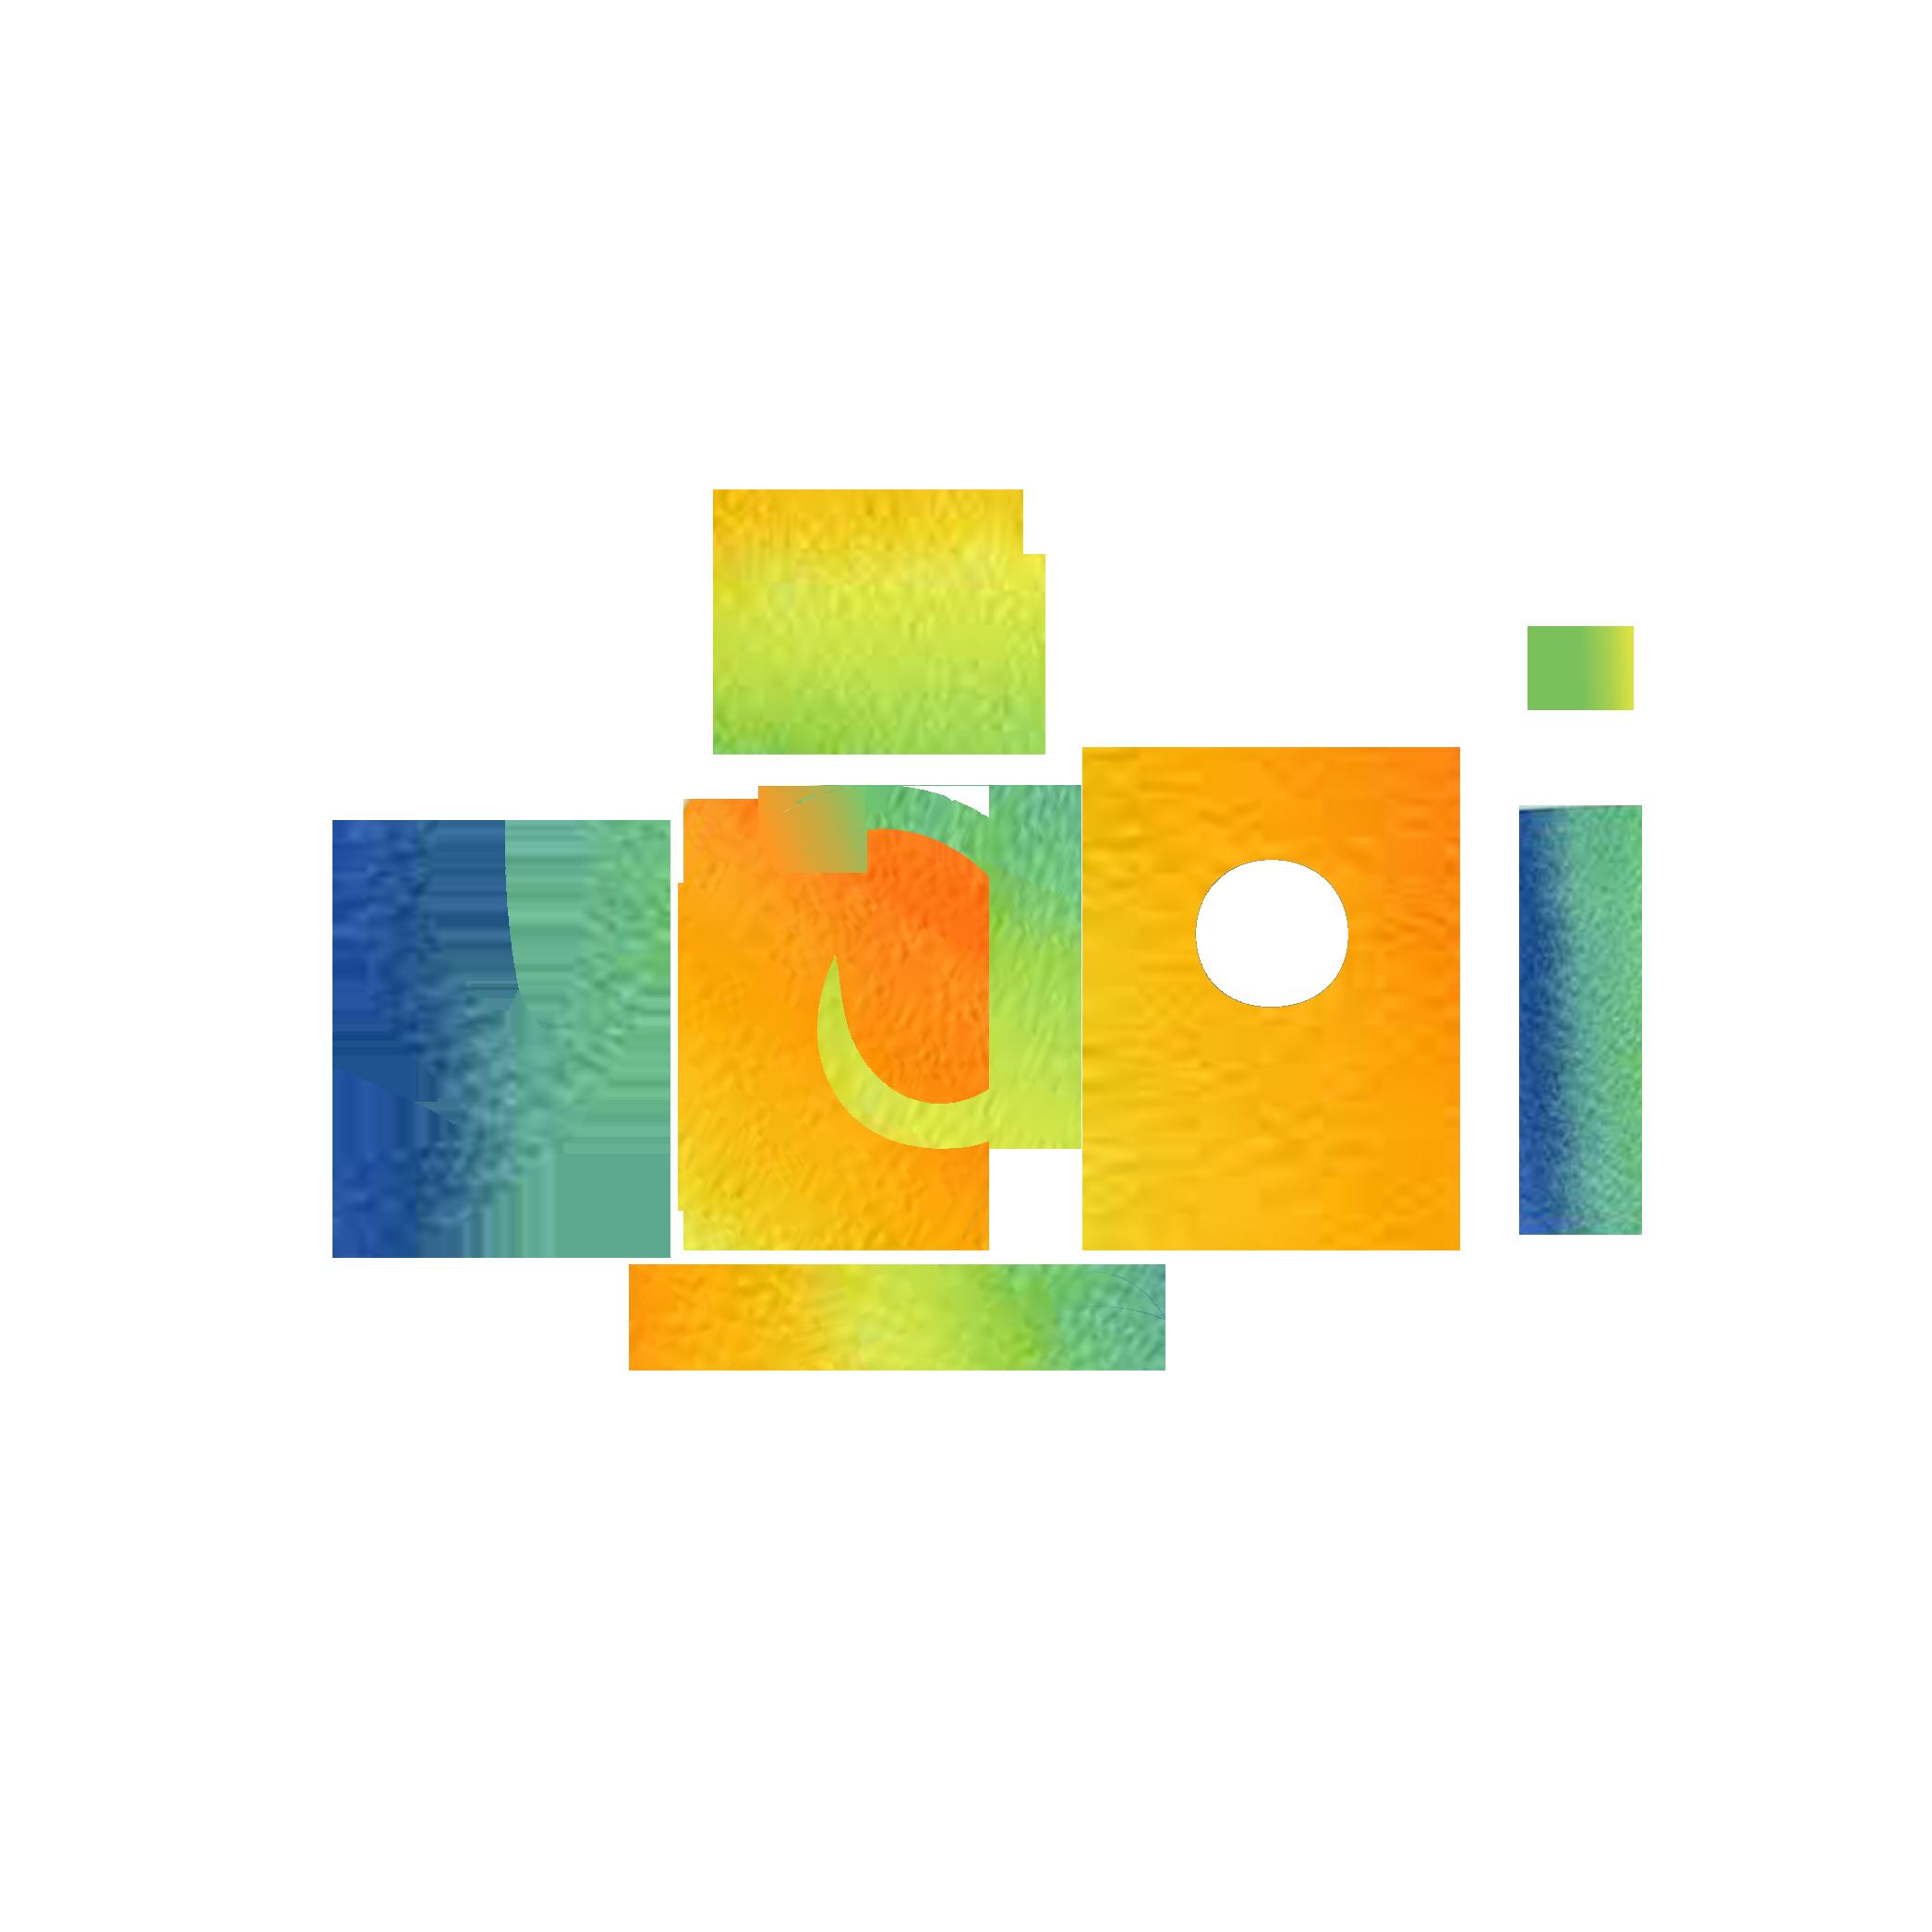 Yogi Pathak